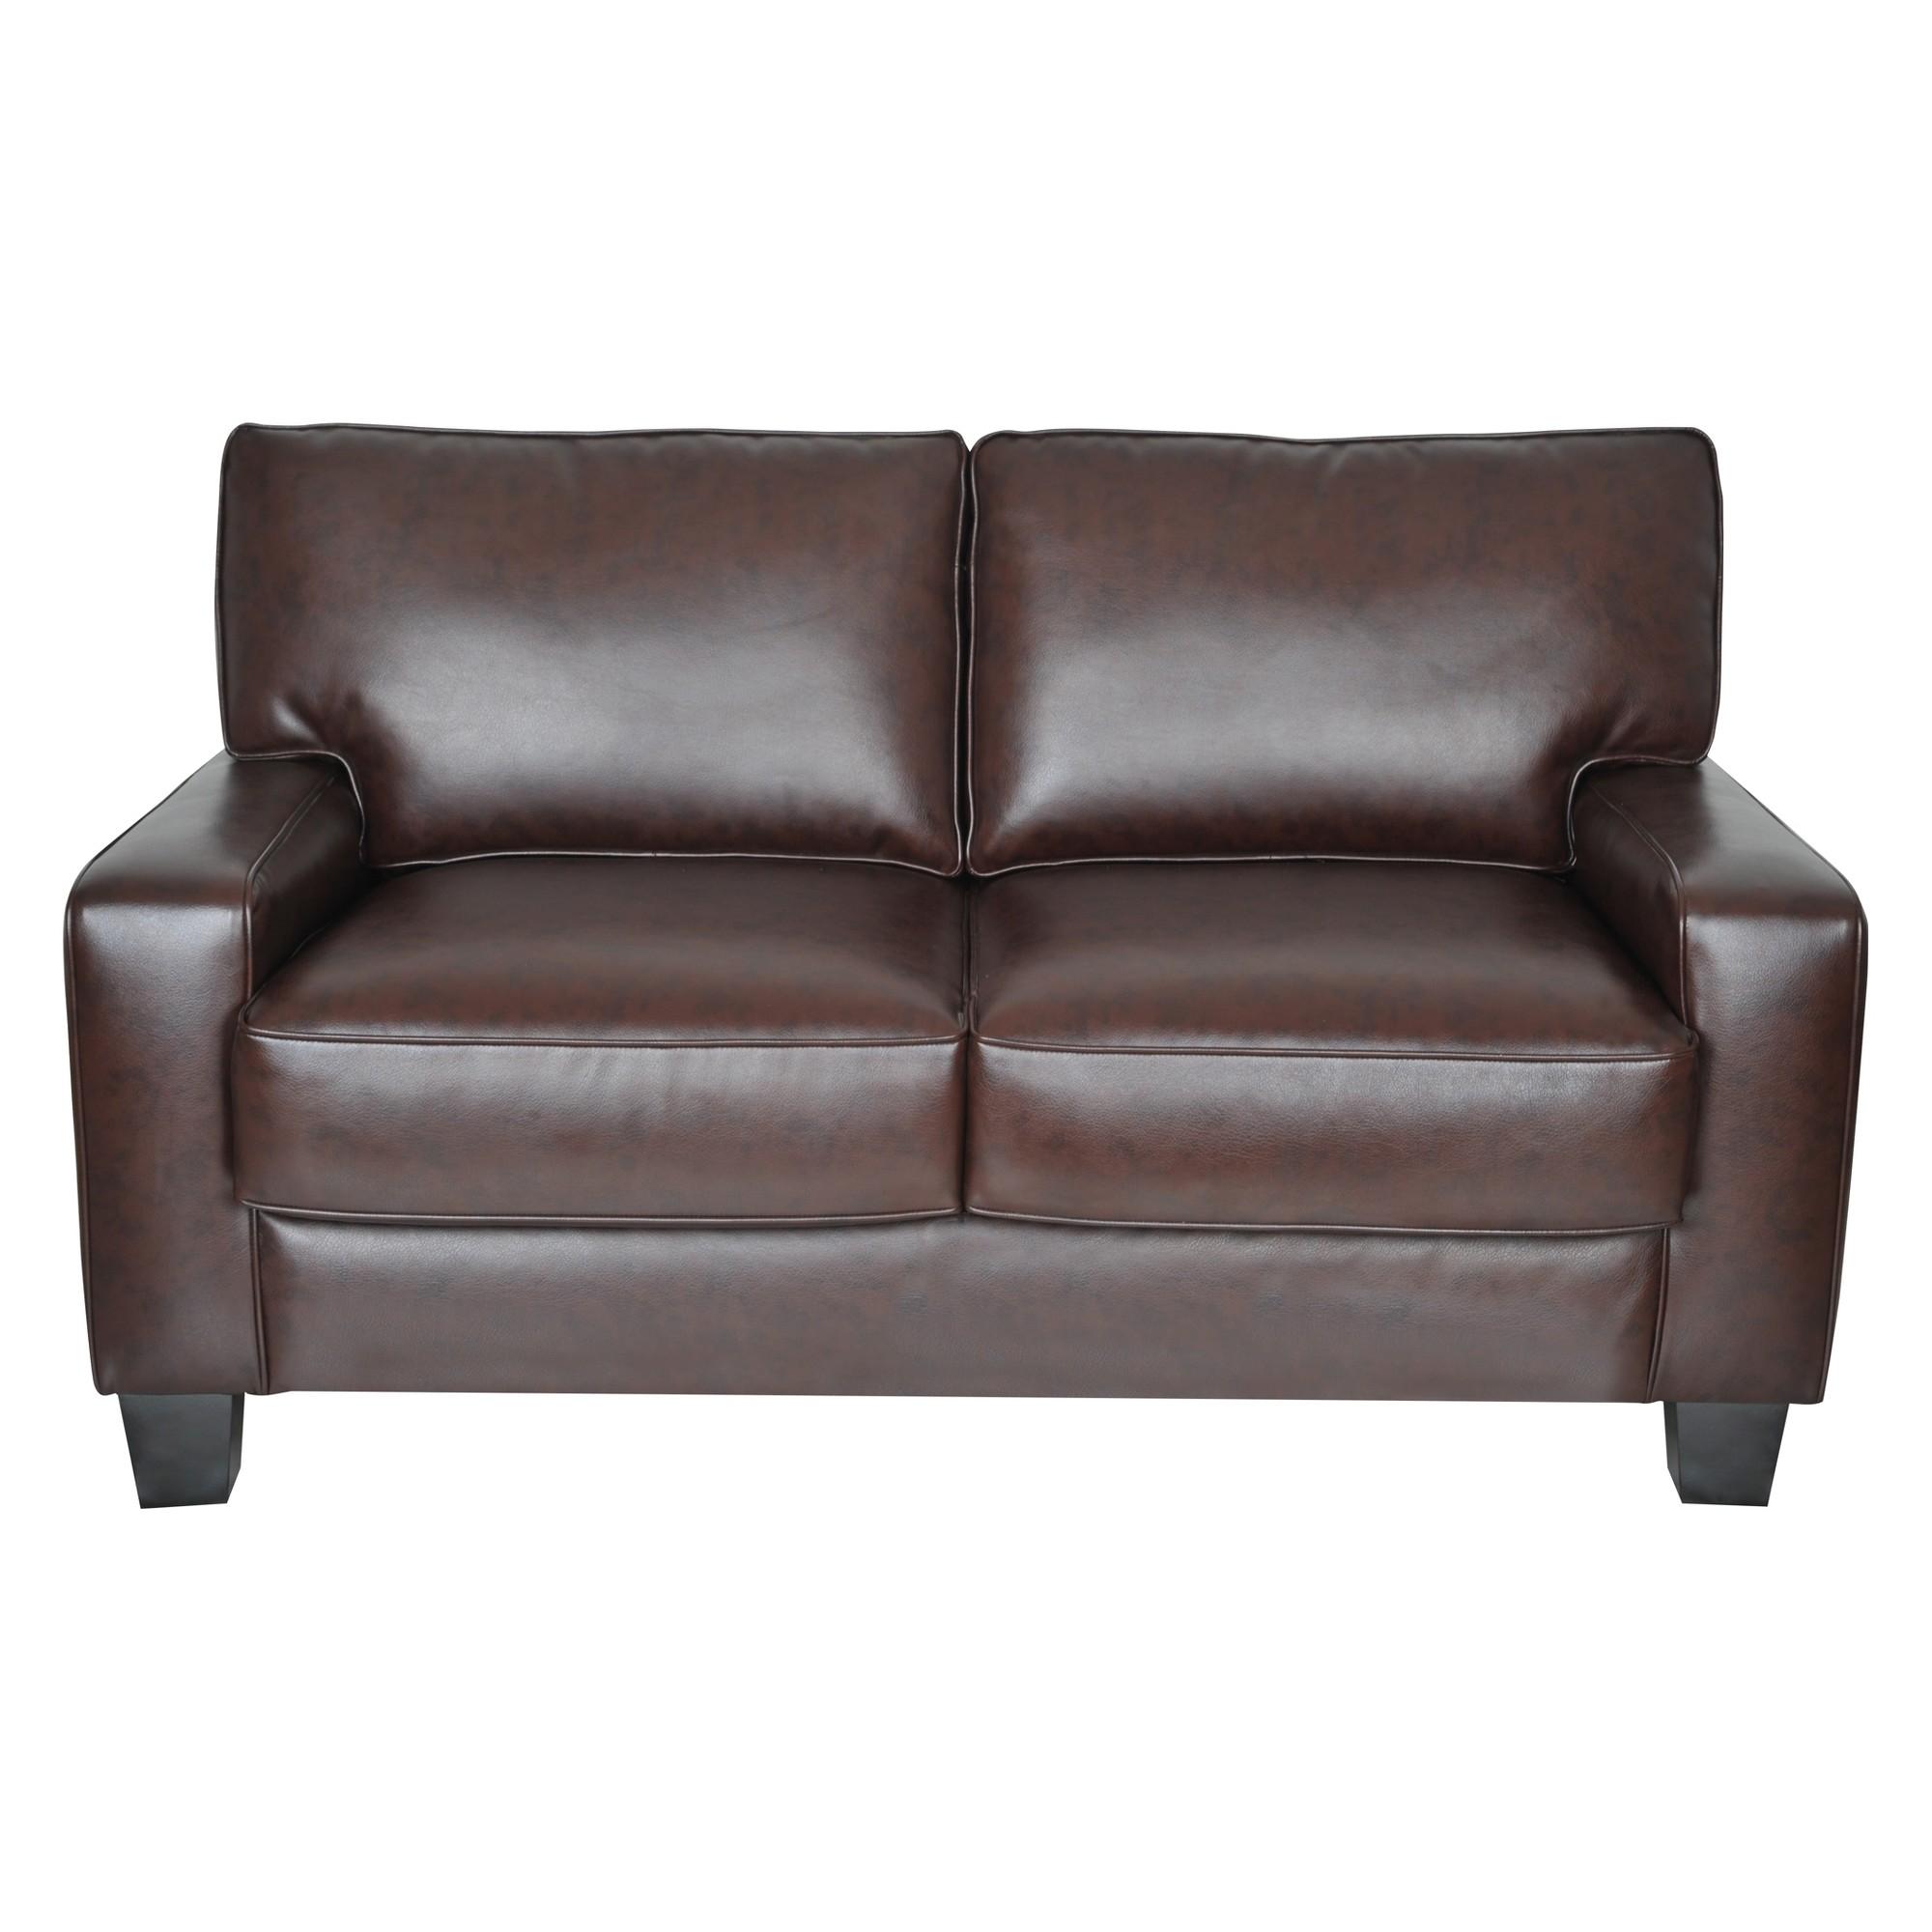 Deep Seating Palisades 61 Chestnut Brown Serta